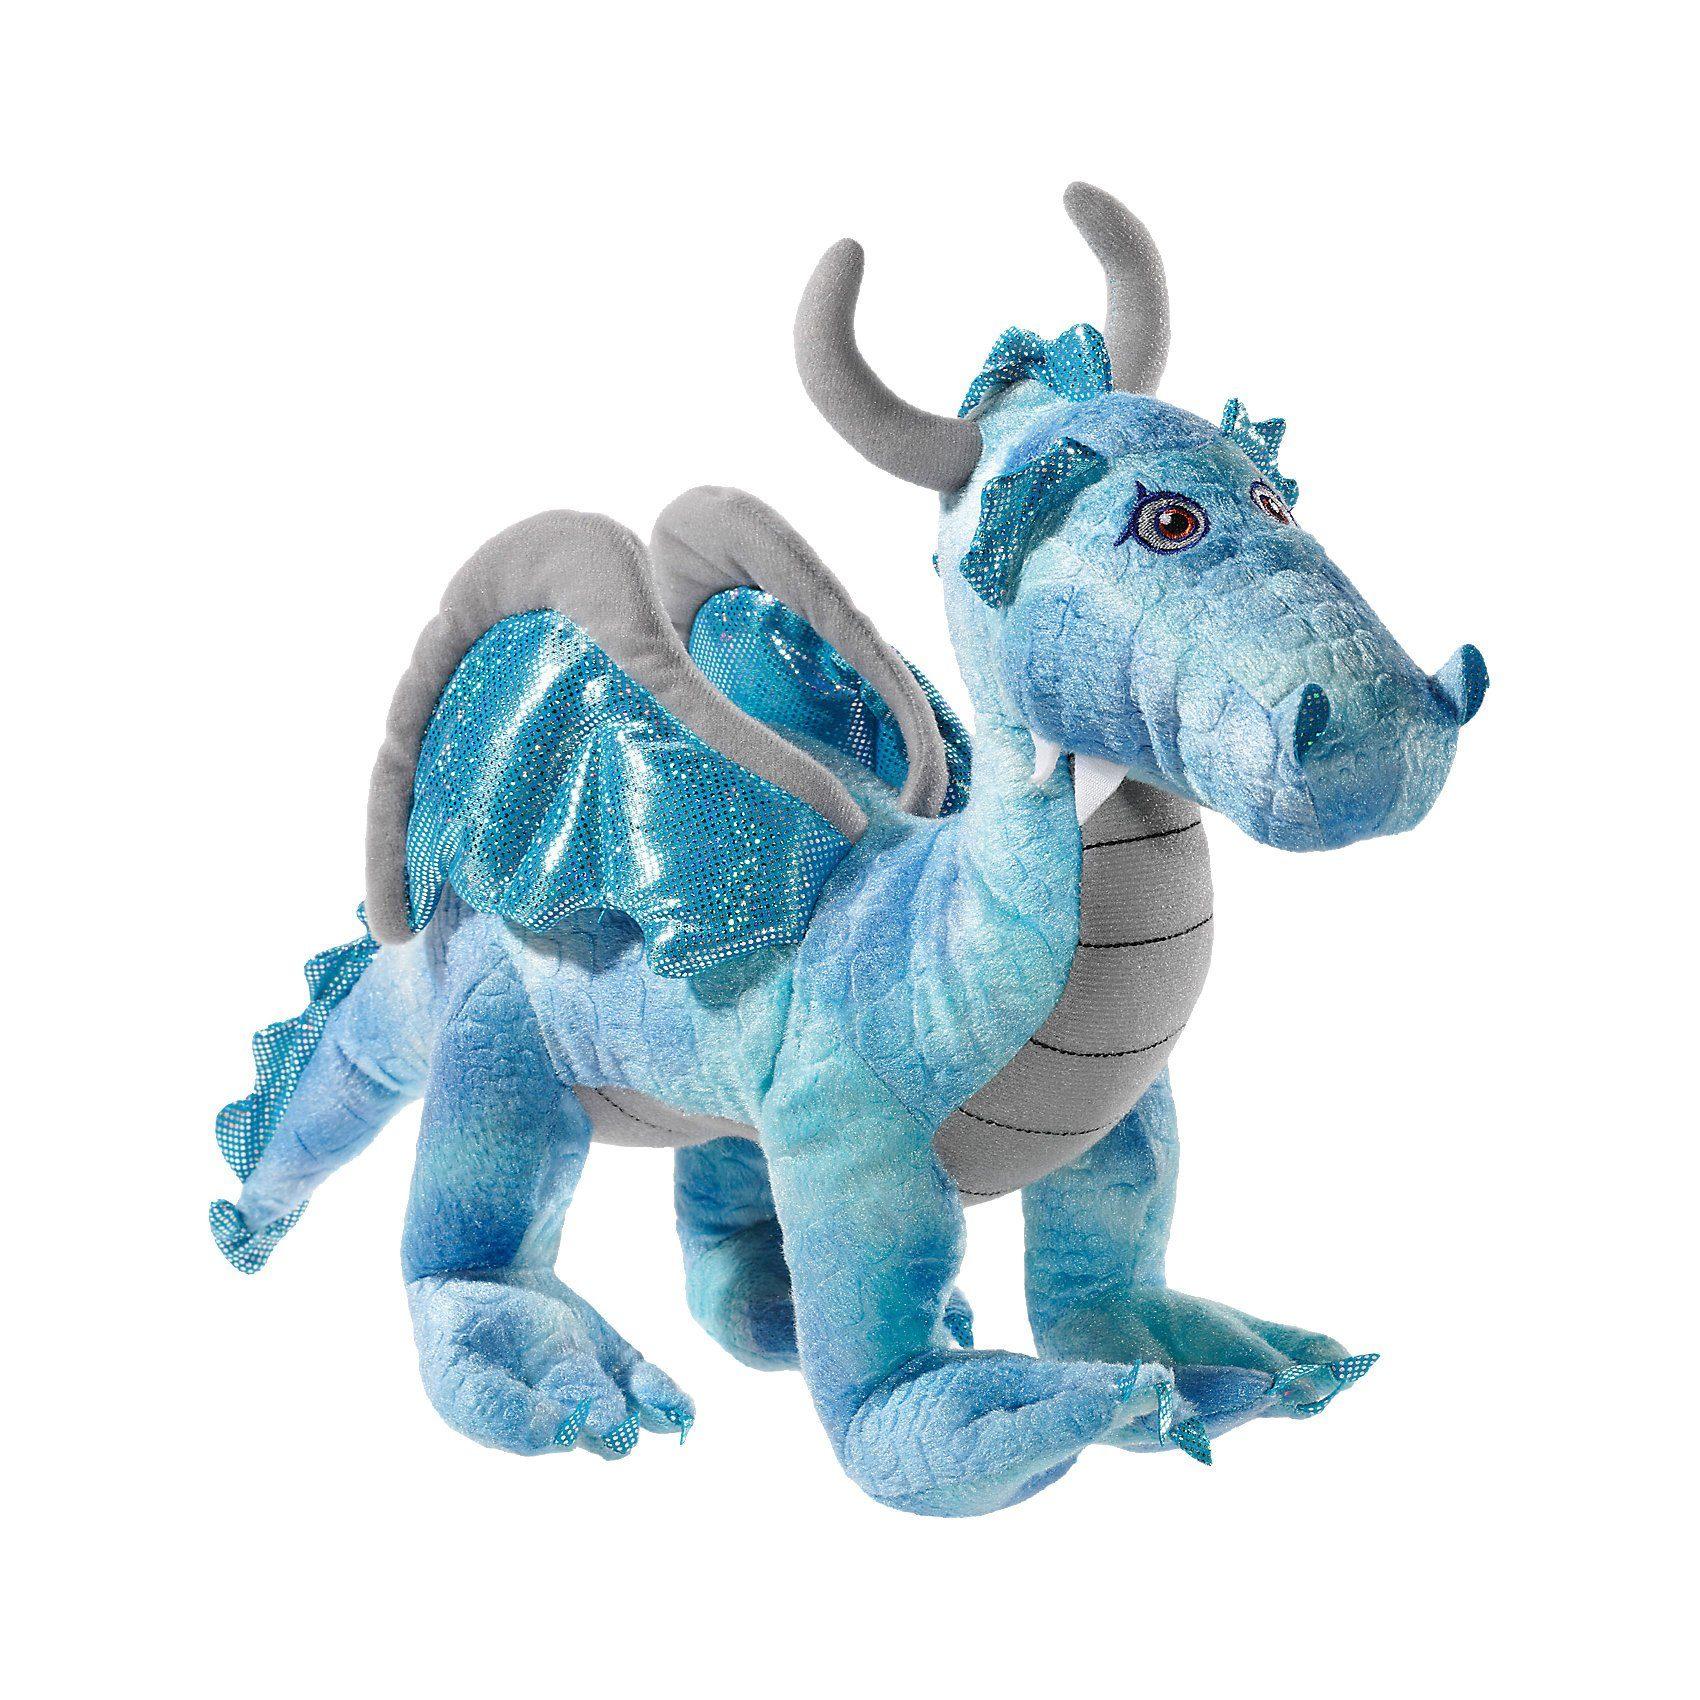 Heunec Drache 35 cm stehend blau